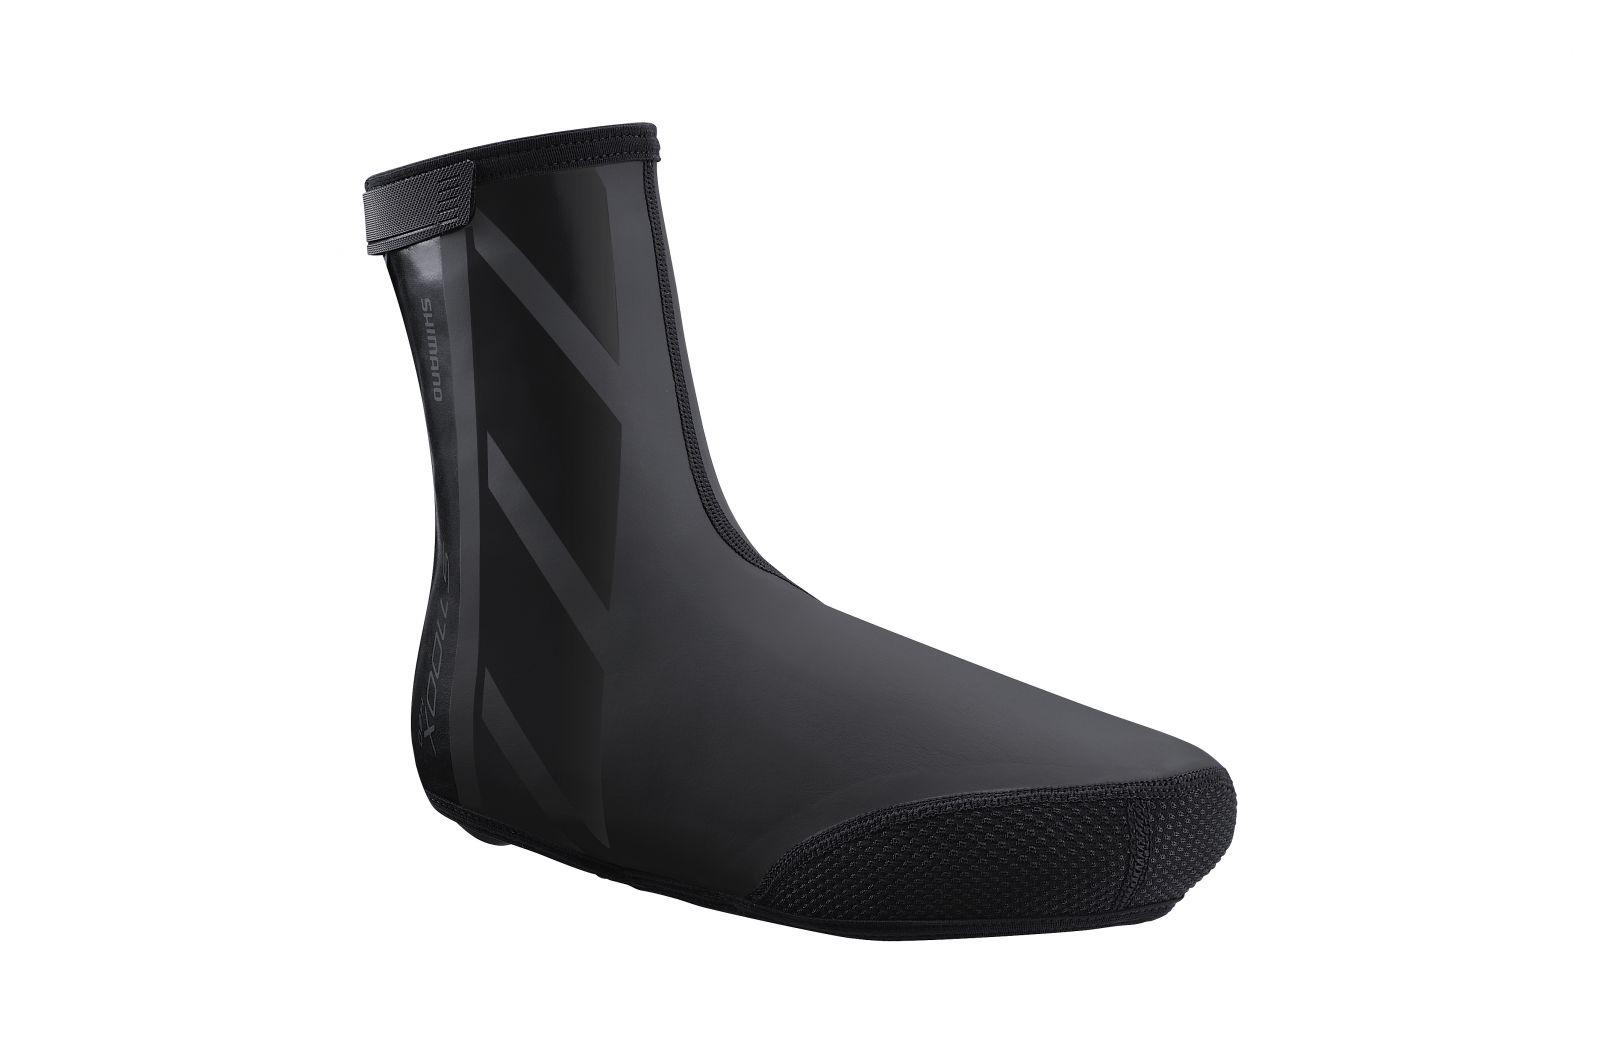 SHIMANO S1100X H2O návleky na obuv, černá, M